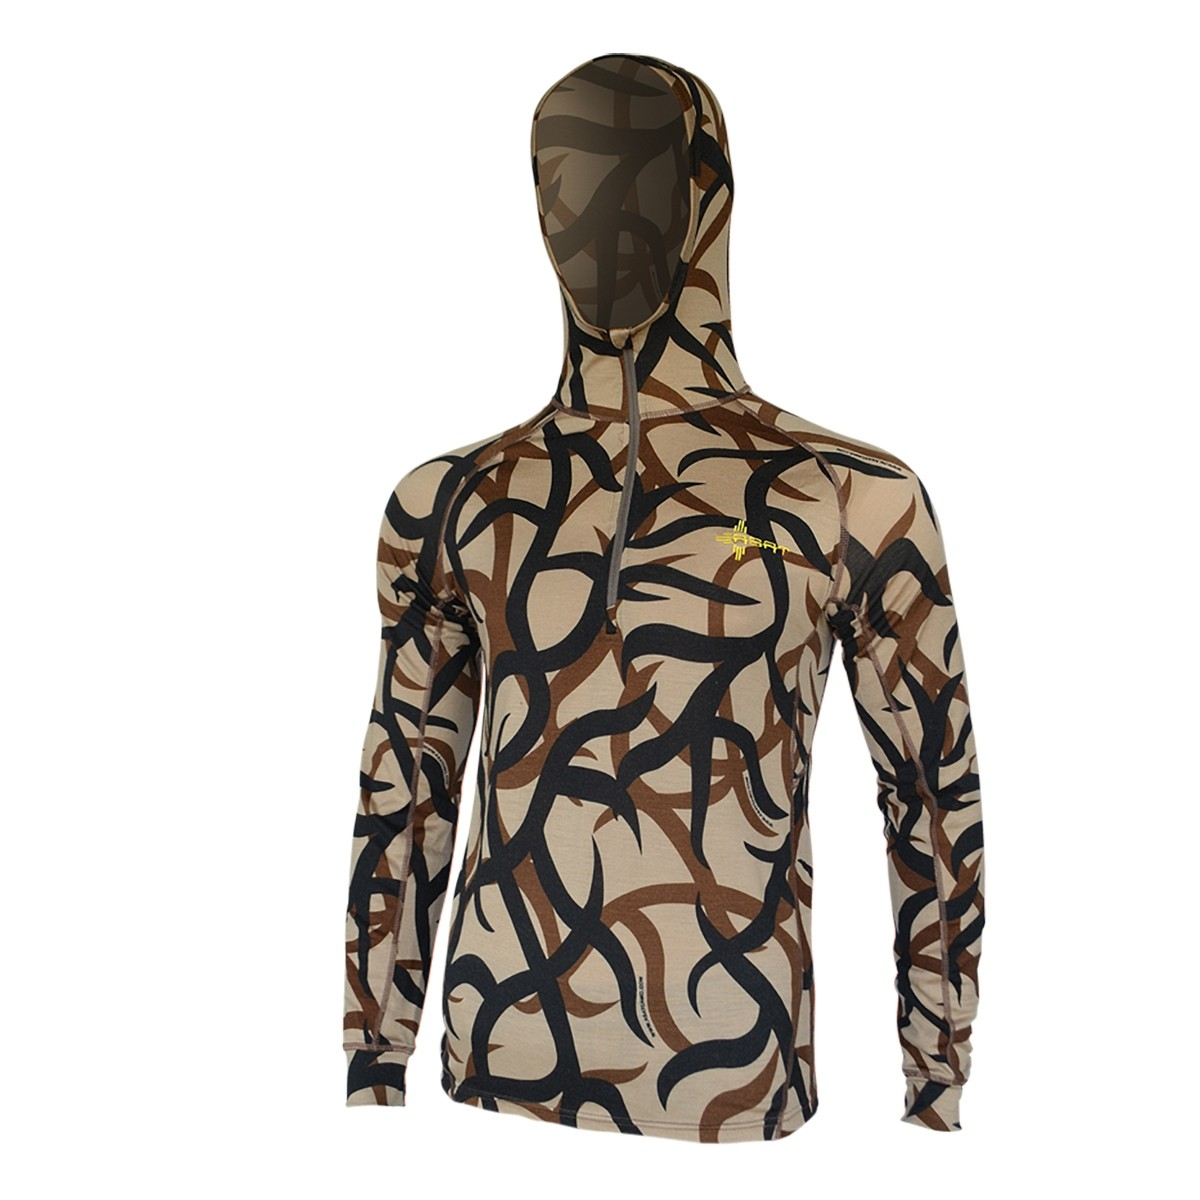 ASAT Bedrock Merino 1 4 Zip Base Layer Hoodie by